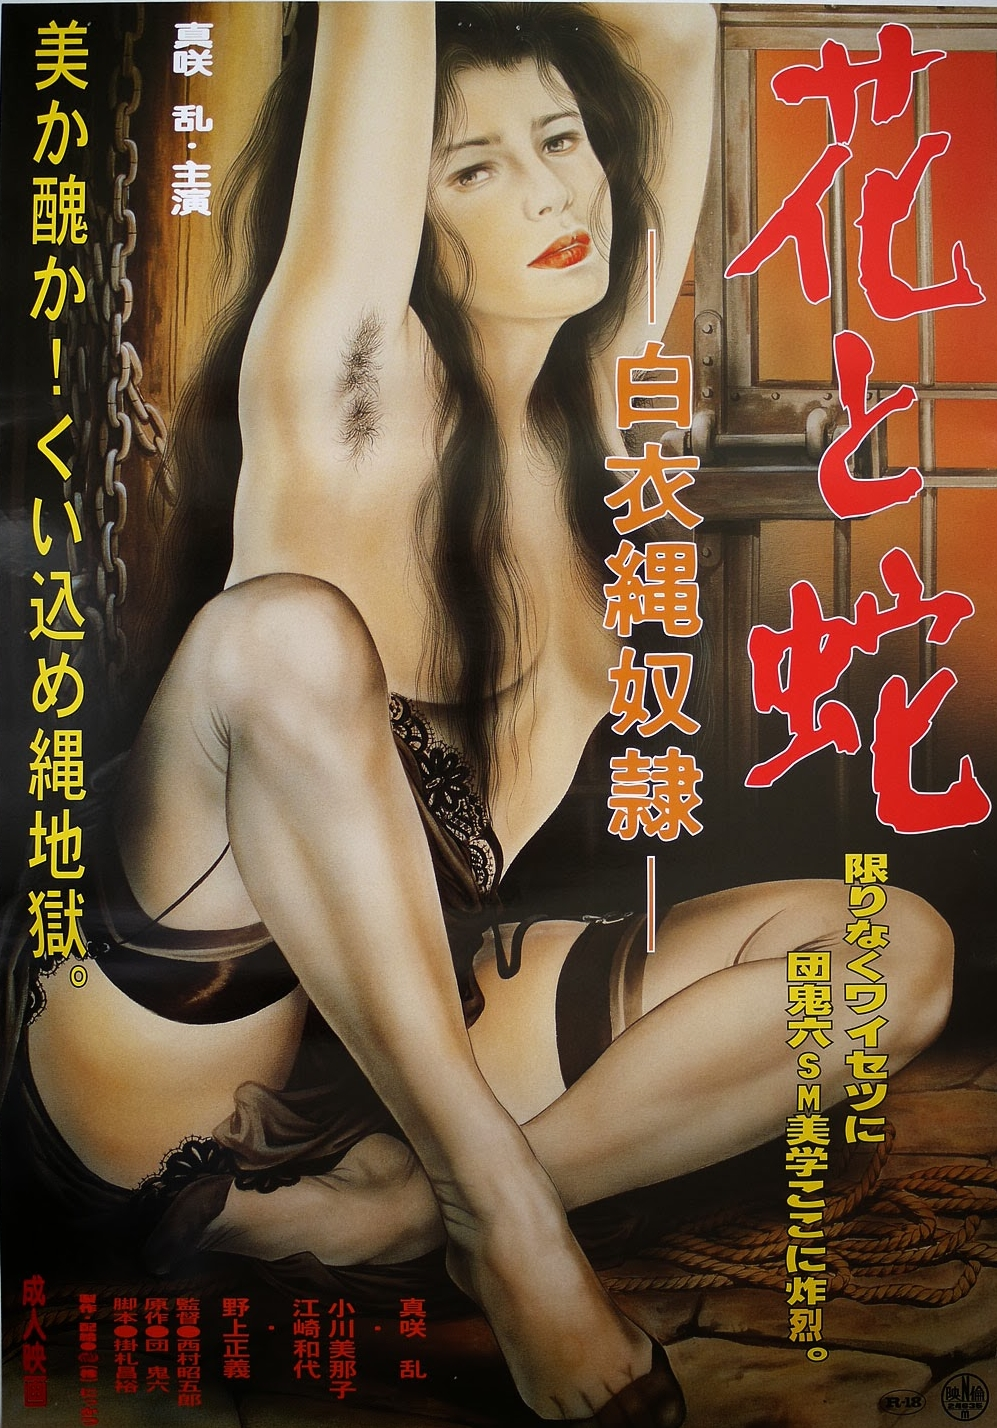 yaponskie-eroticheskie-filmi-onlayn